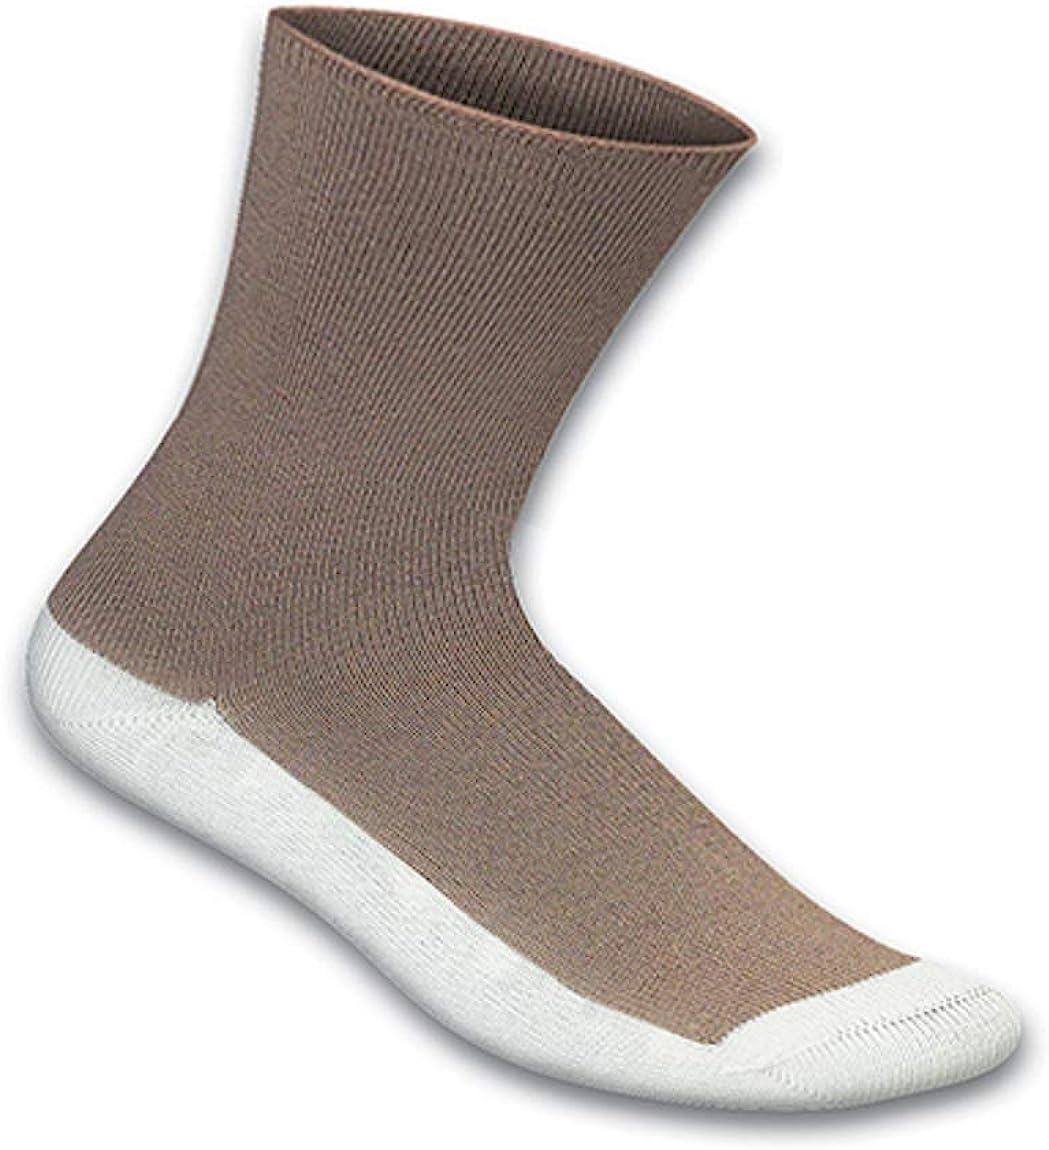 Orthofeet Non-Binding Non-Constrictive Circulation Seam Free Bamboo Brown Casual Dress Socks, 3 Pack